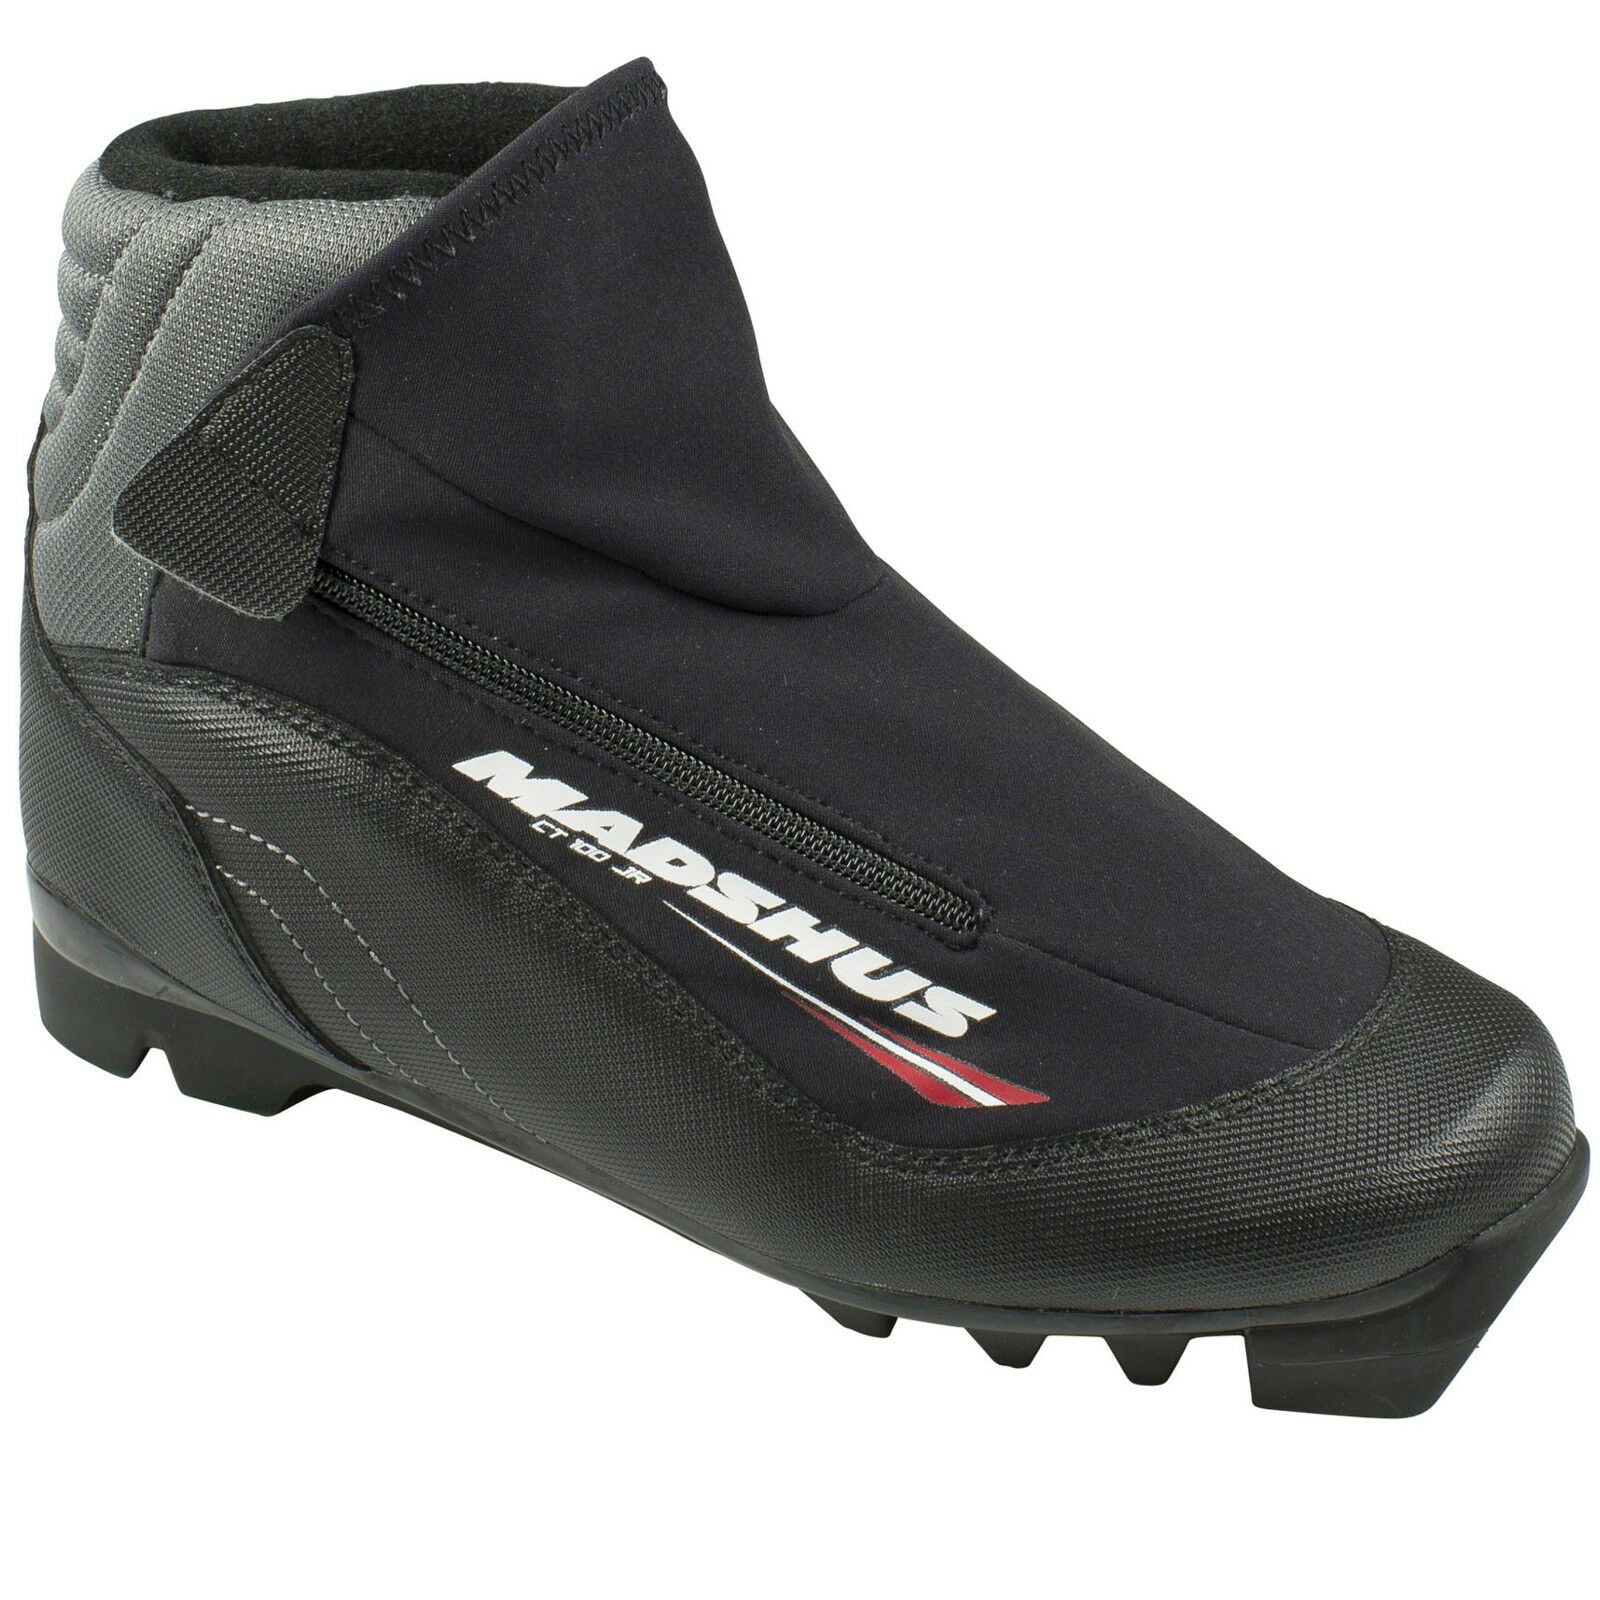 Madshus CT 100 Langlaufschuhe Unisex NNN-System NIS kompatibel Ski-Schuhe NEU